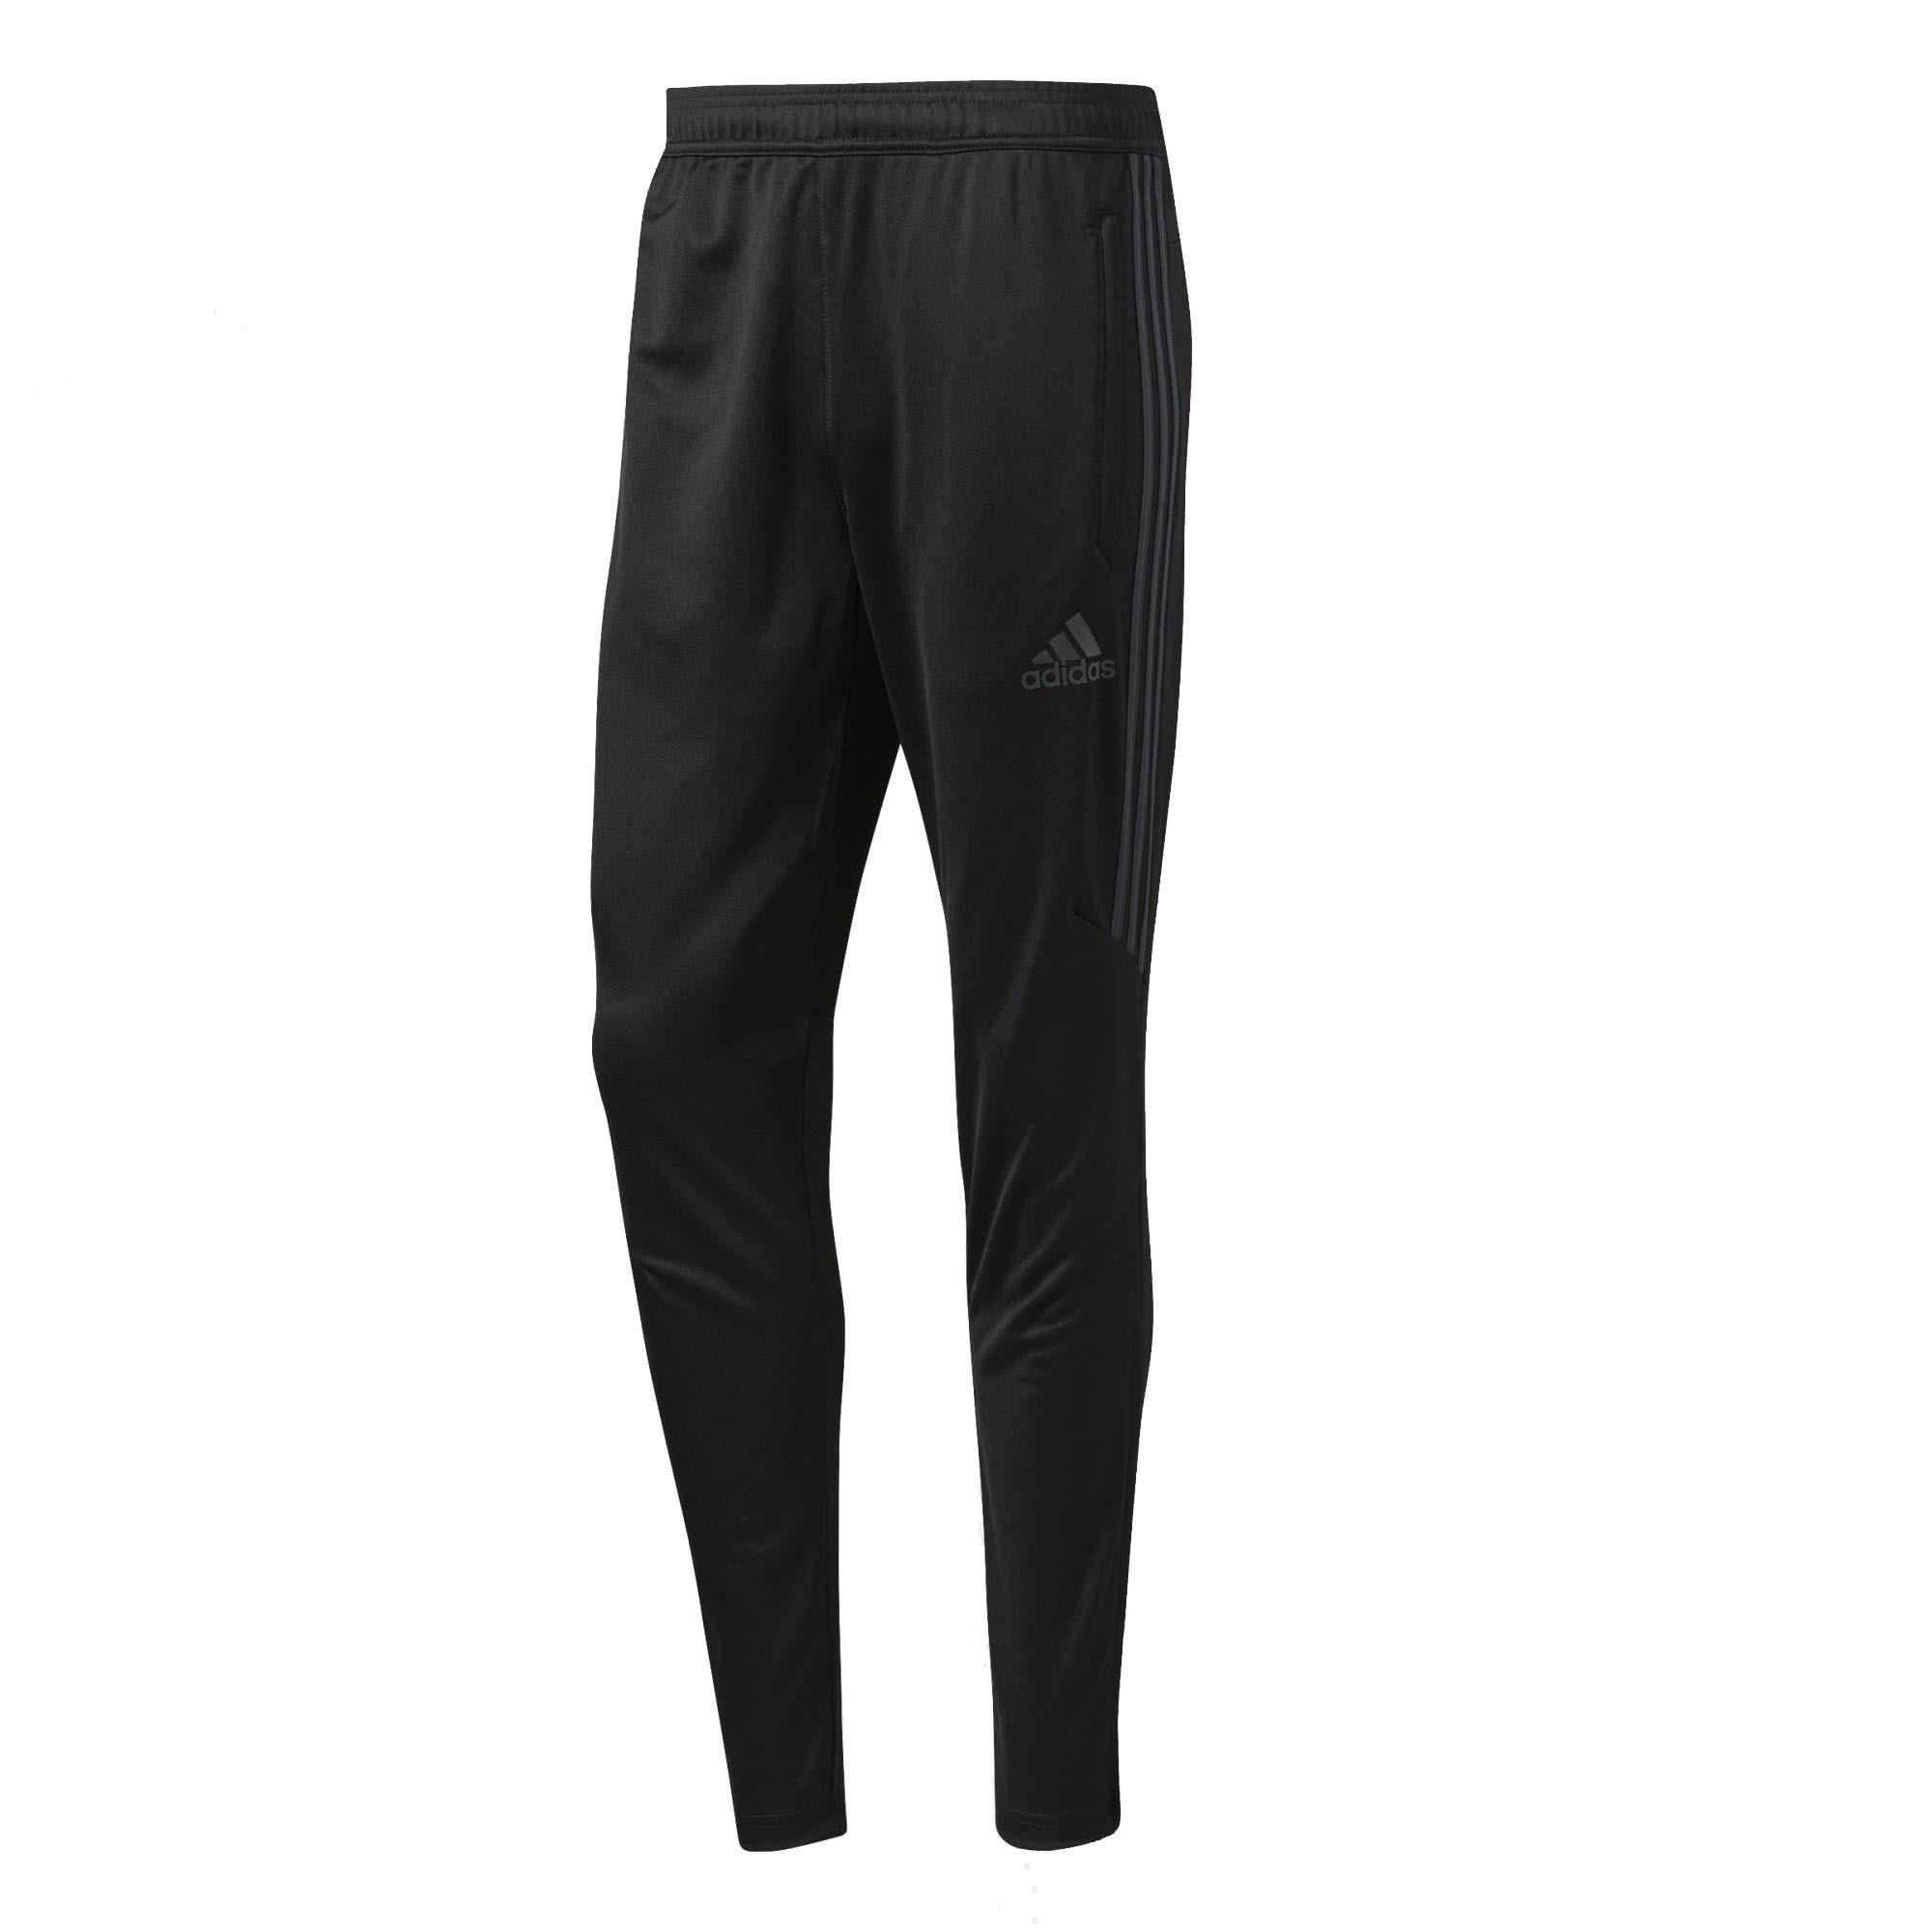 allenamento Nero 17 Adidas Uomo Tiro S Pantaloni da YWED9HI2